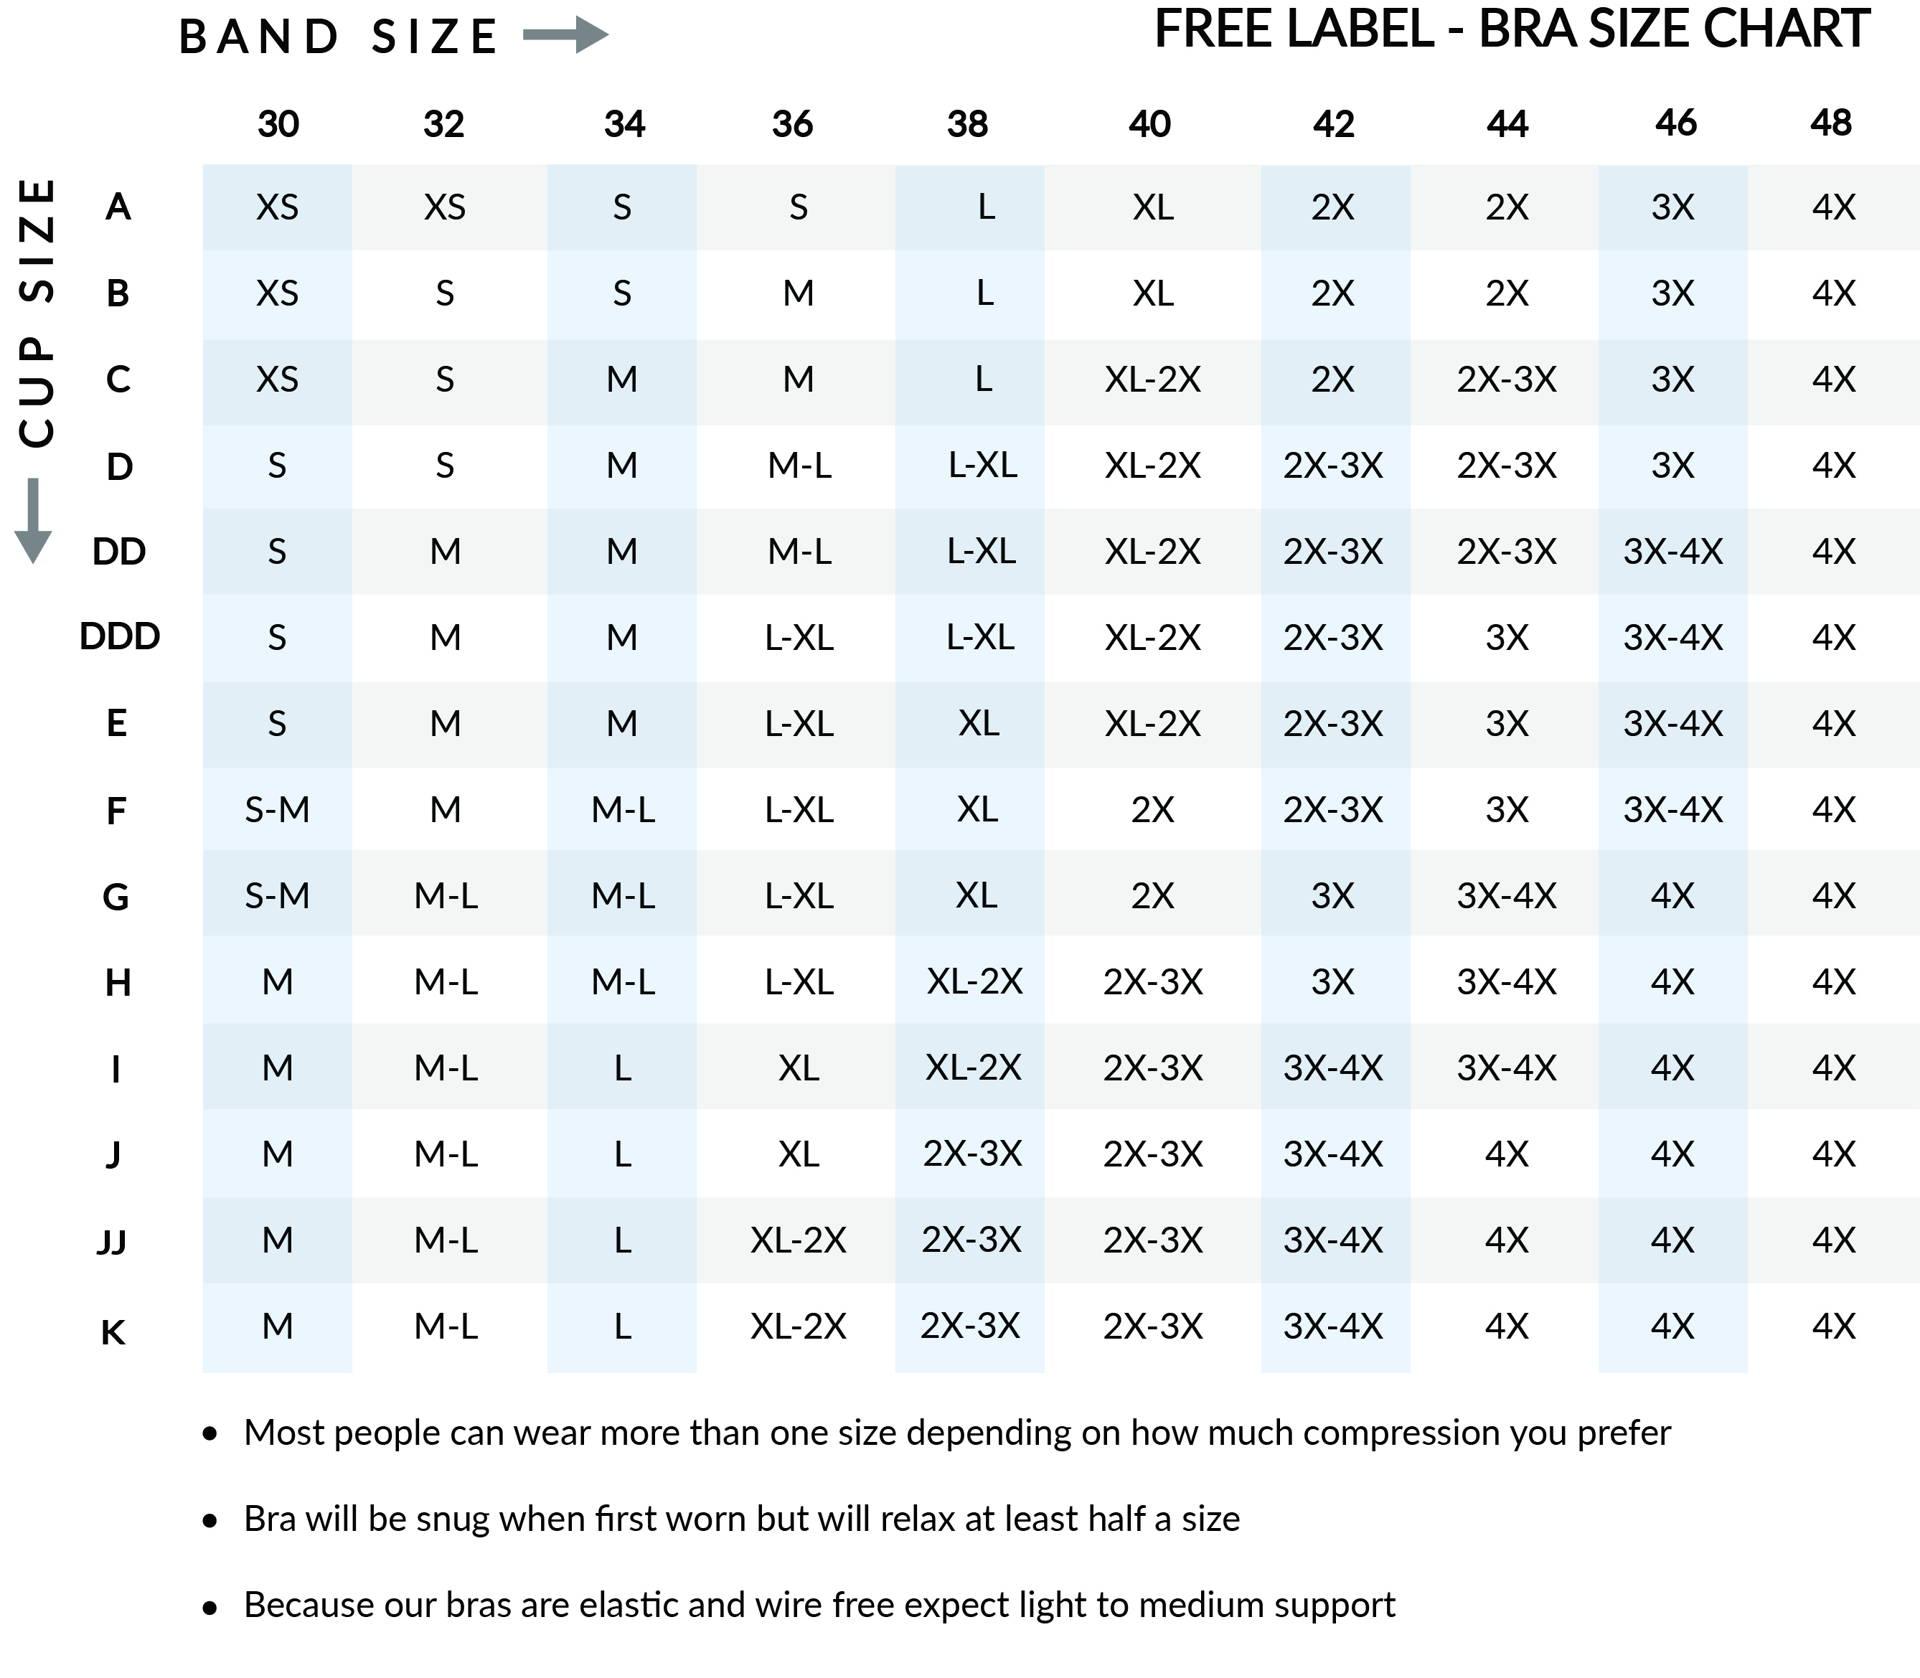 bra size chart Free Label